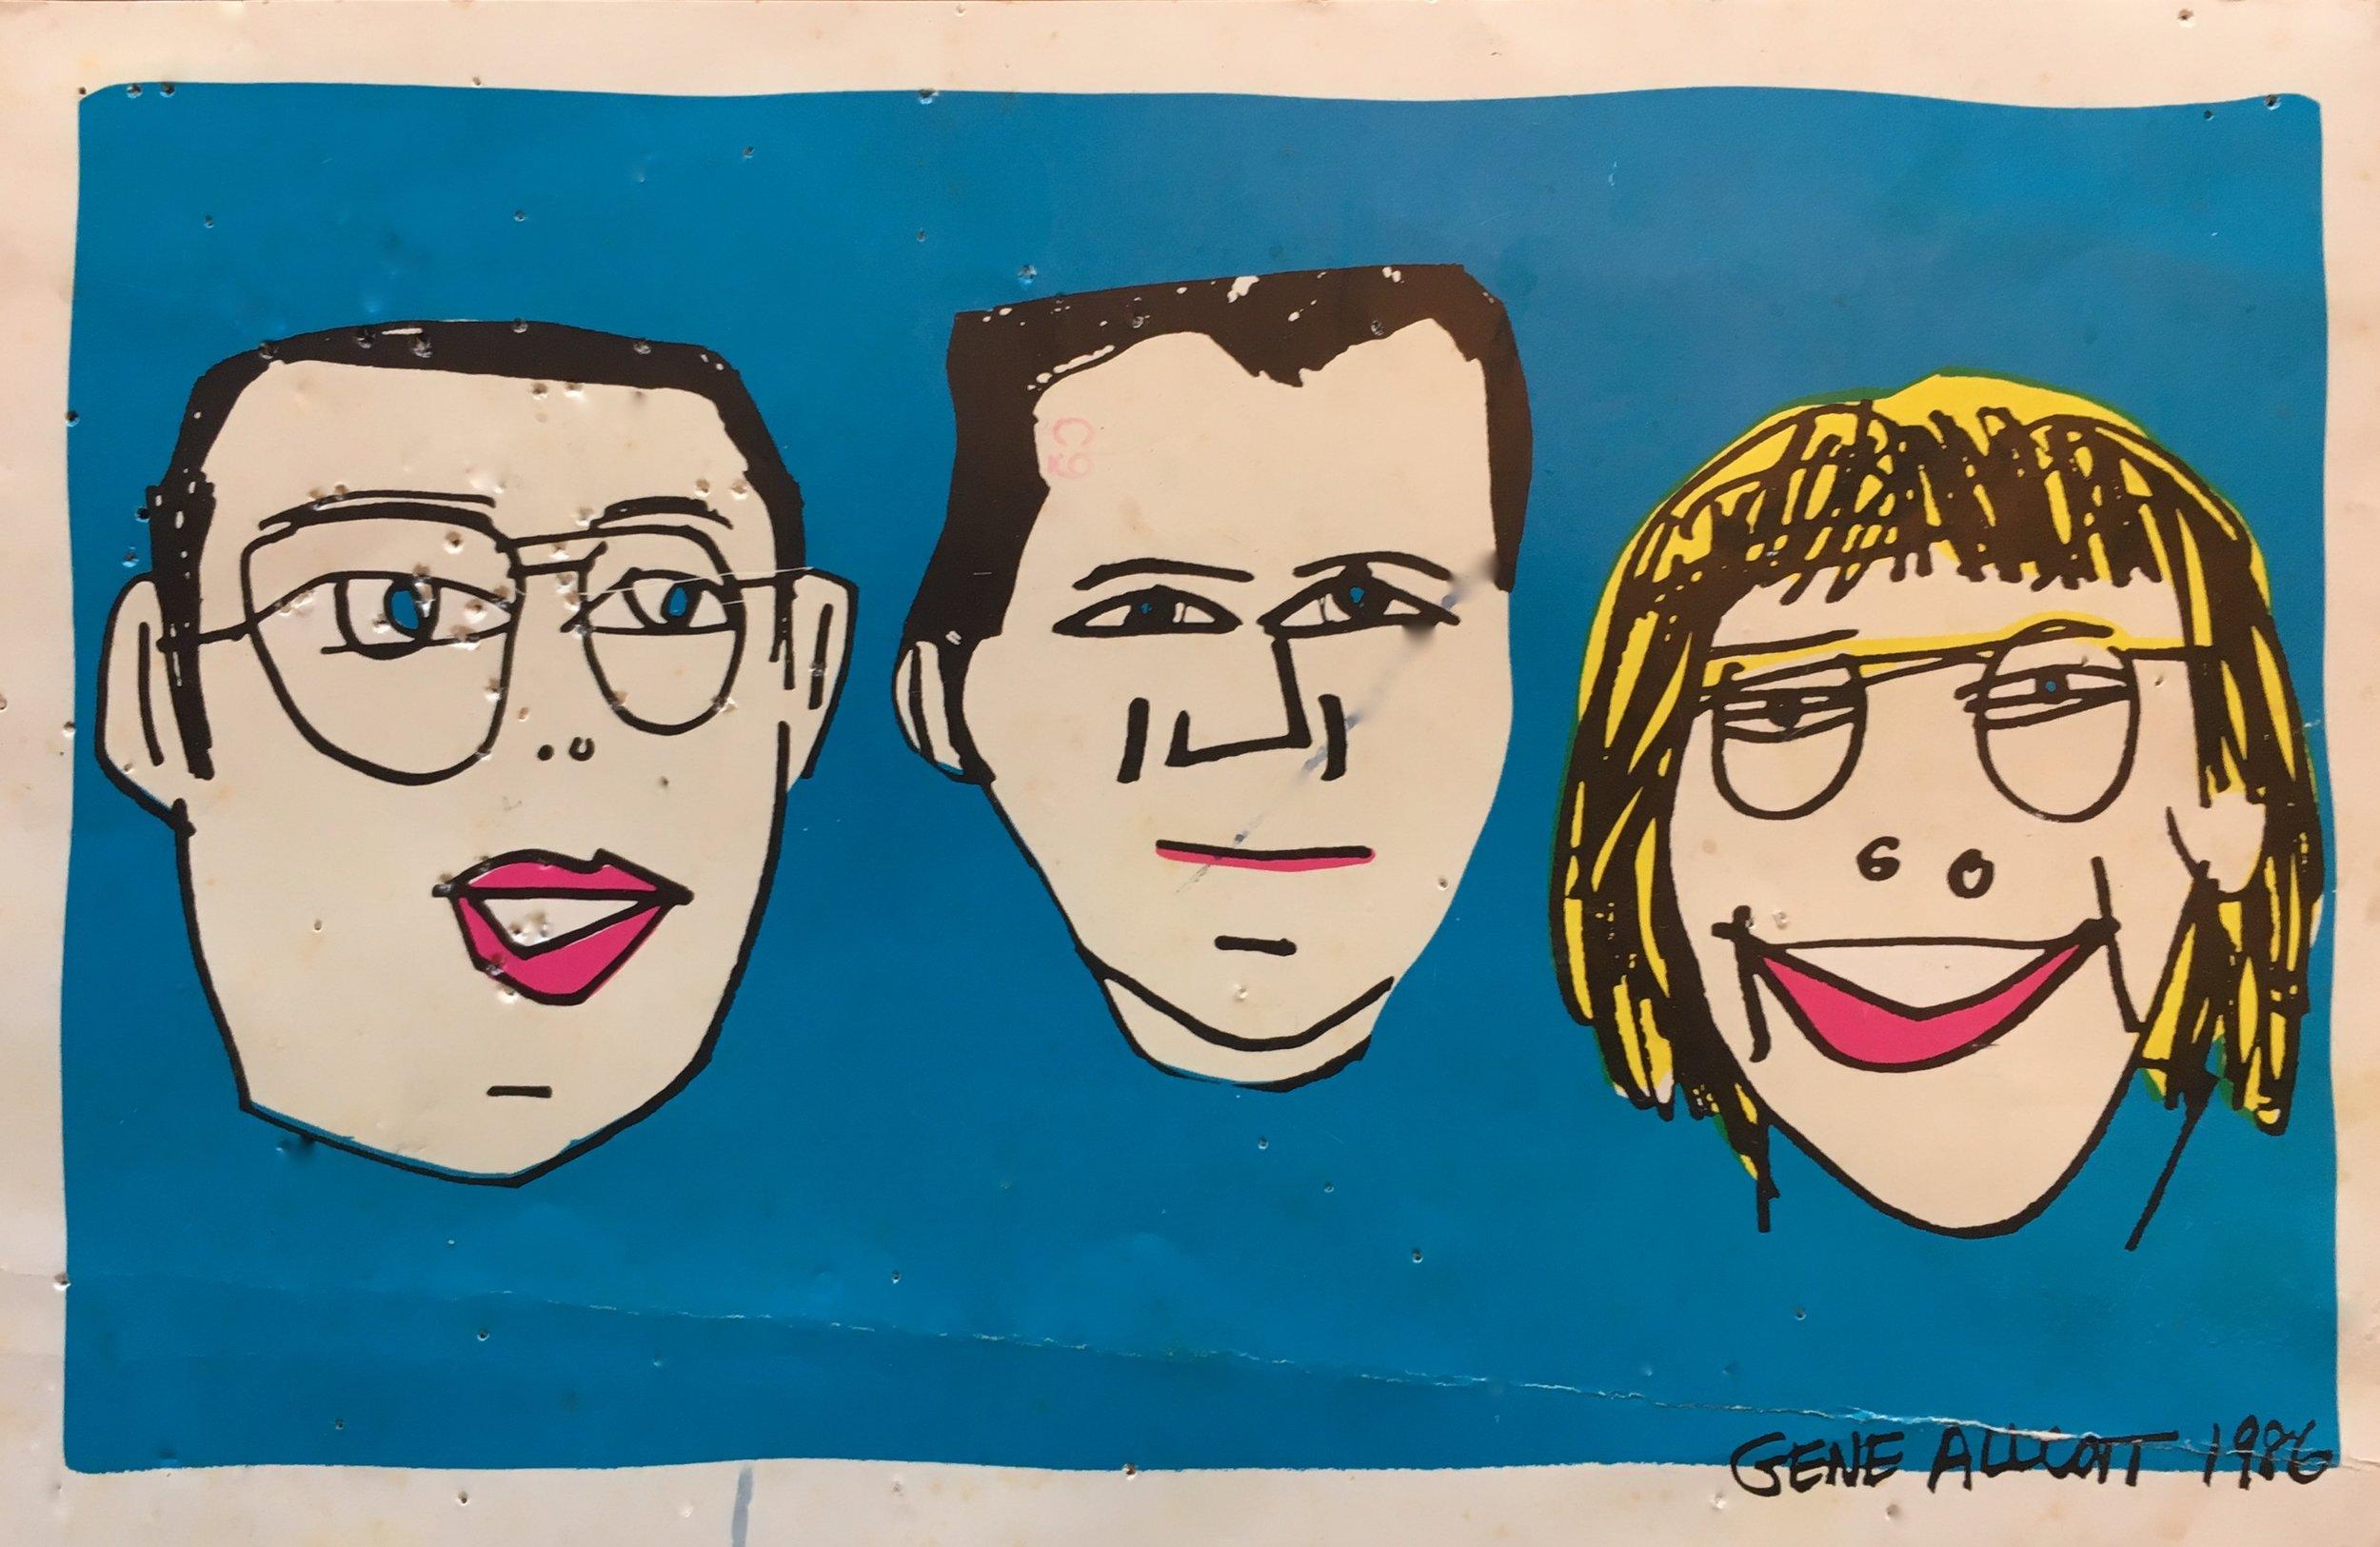 Ersatz Gallery Group: Gene Allcott, Jere Brookshire and Dennis Darling, 1986